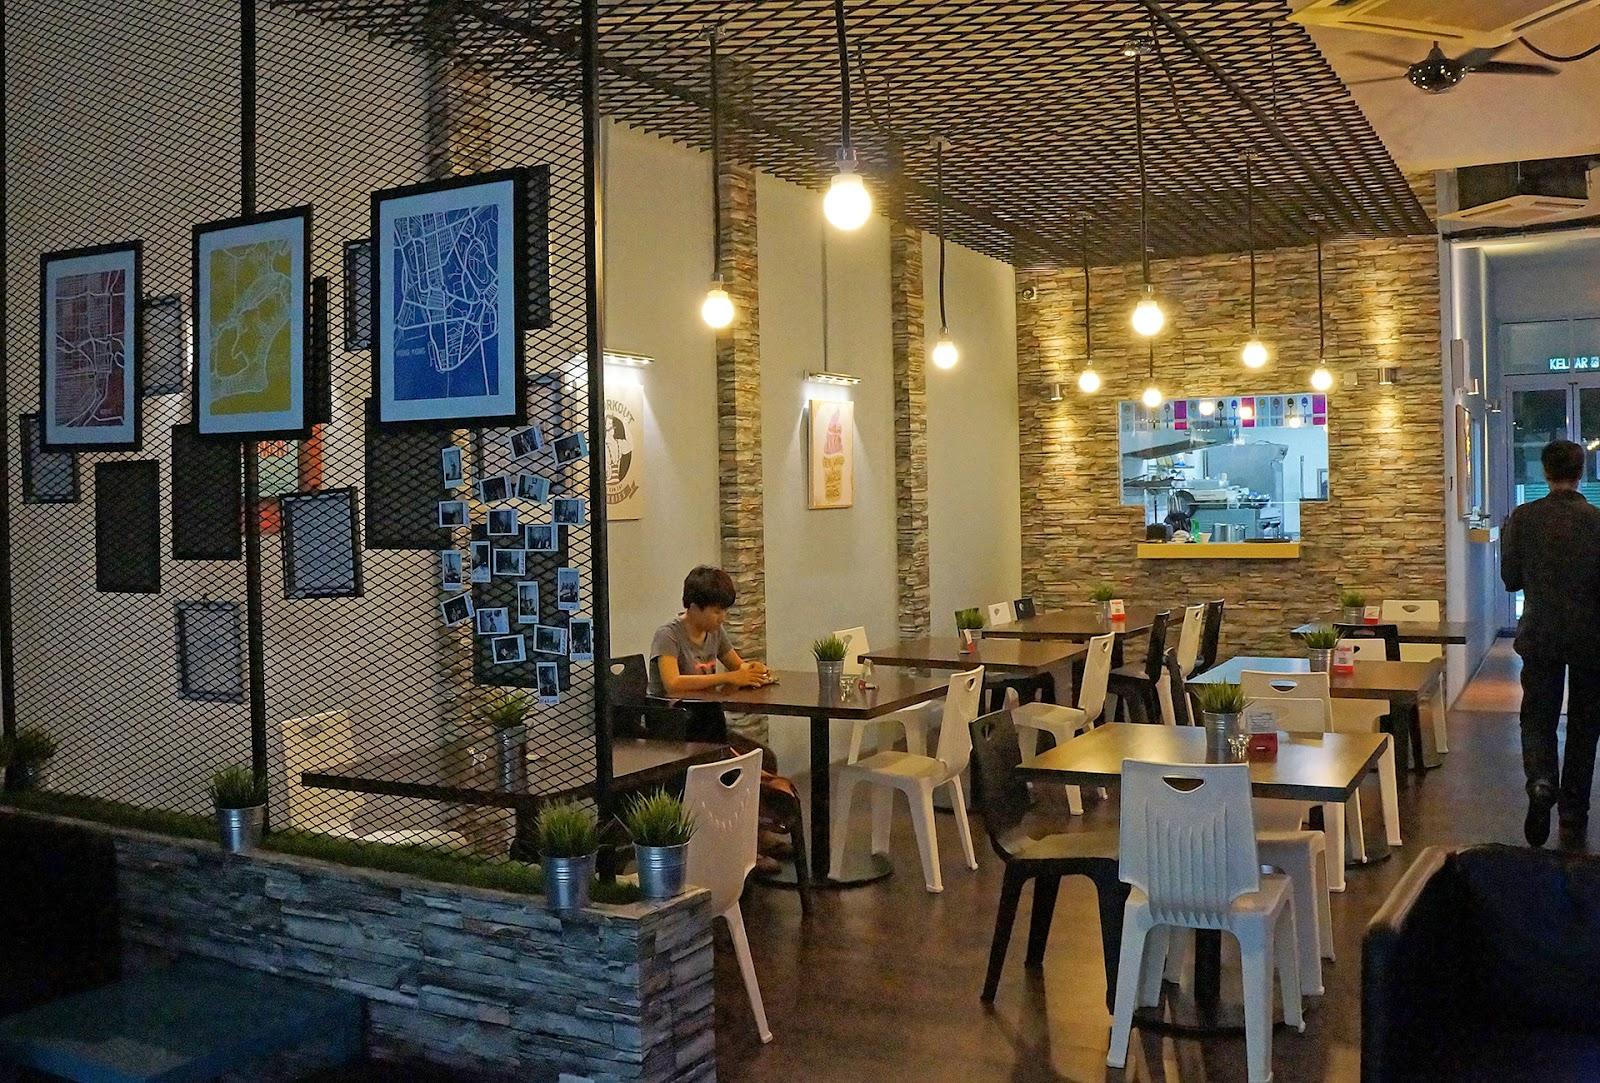 kitchen island designs with seating cost cabinets 贪吃的狗: (新店)the hungry spoon @ sri petaling 加拿大学厨归来的年轻厨师